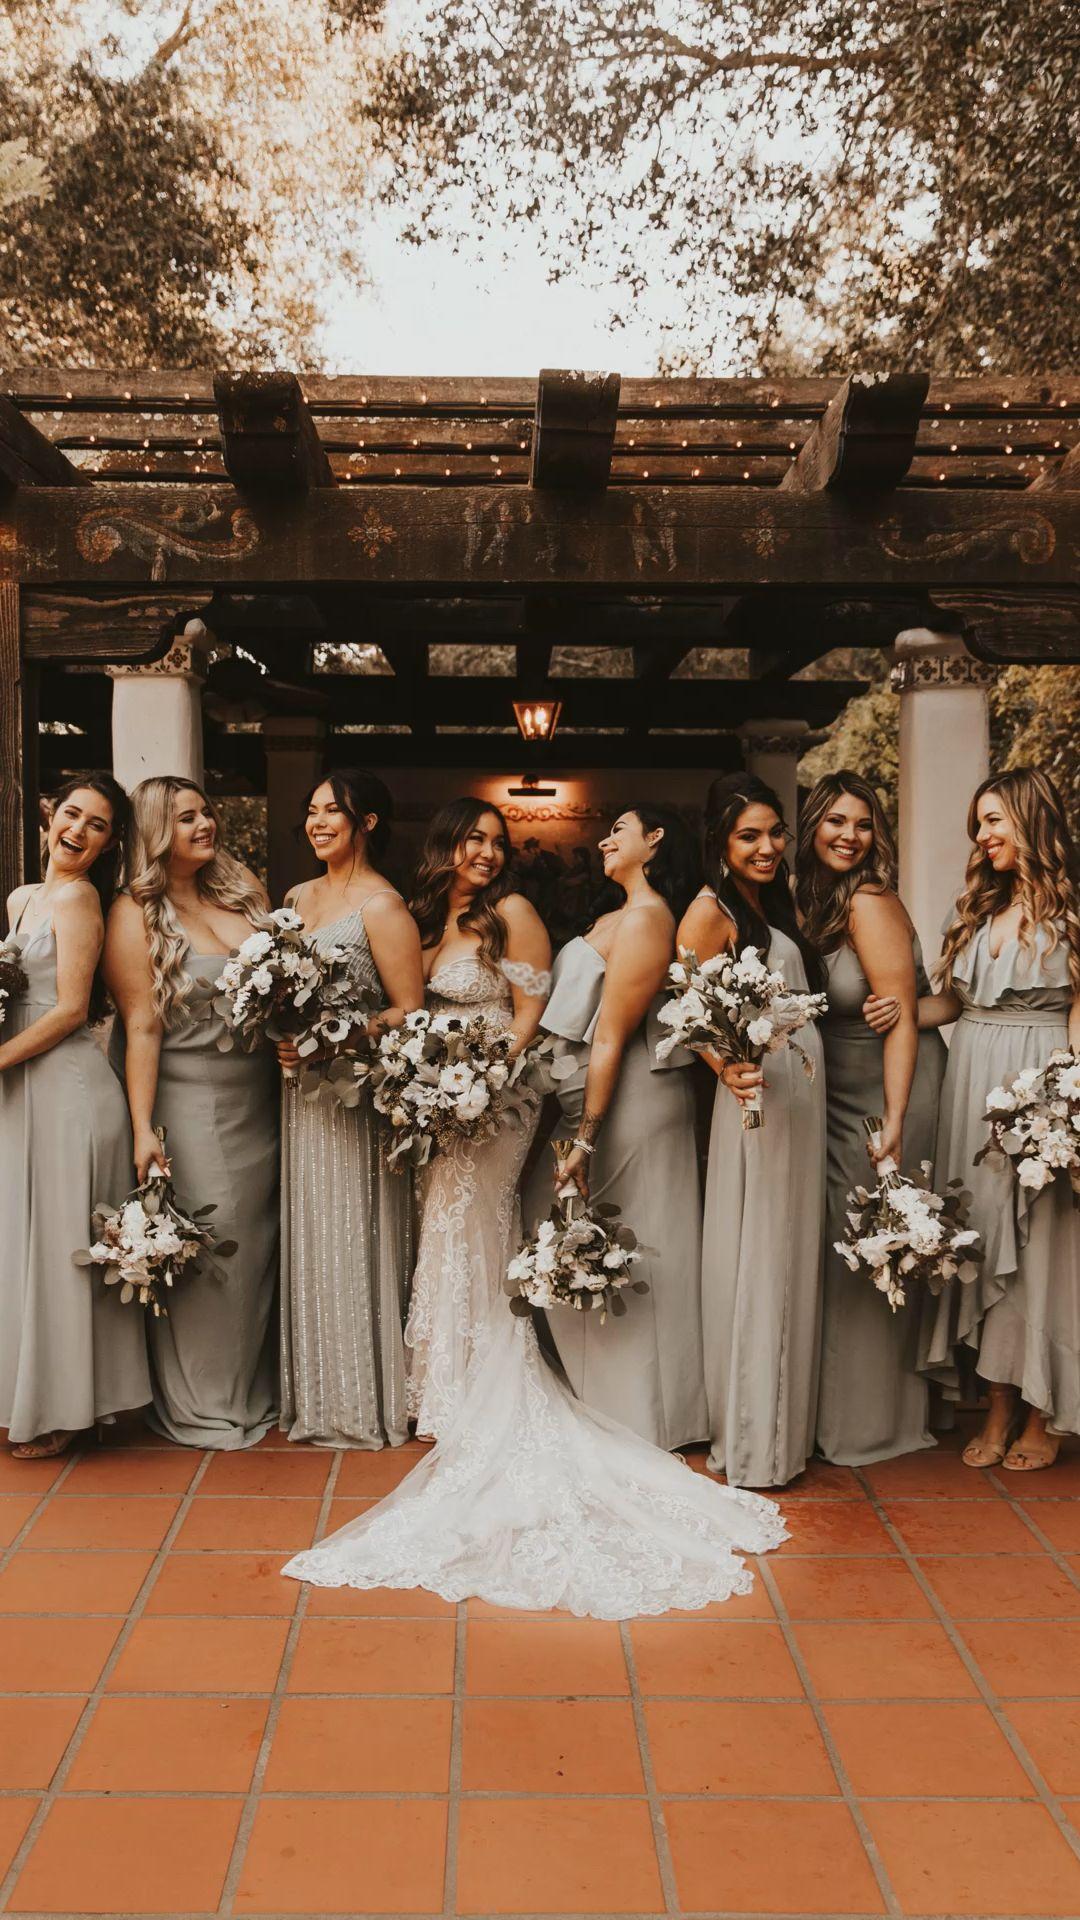 Bridesmaids boho wedding